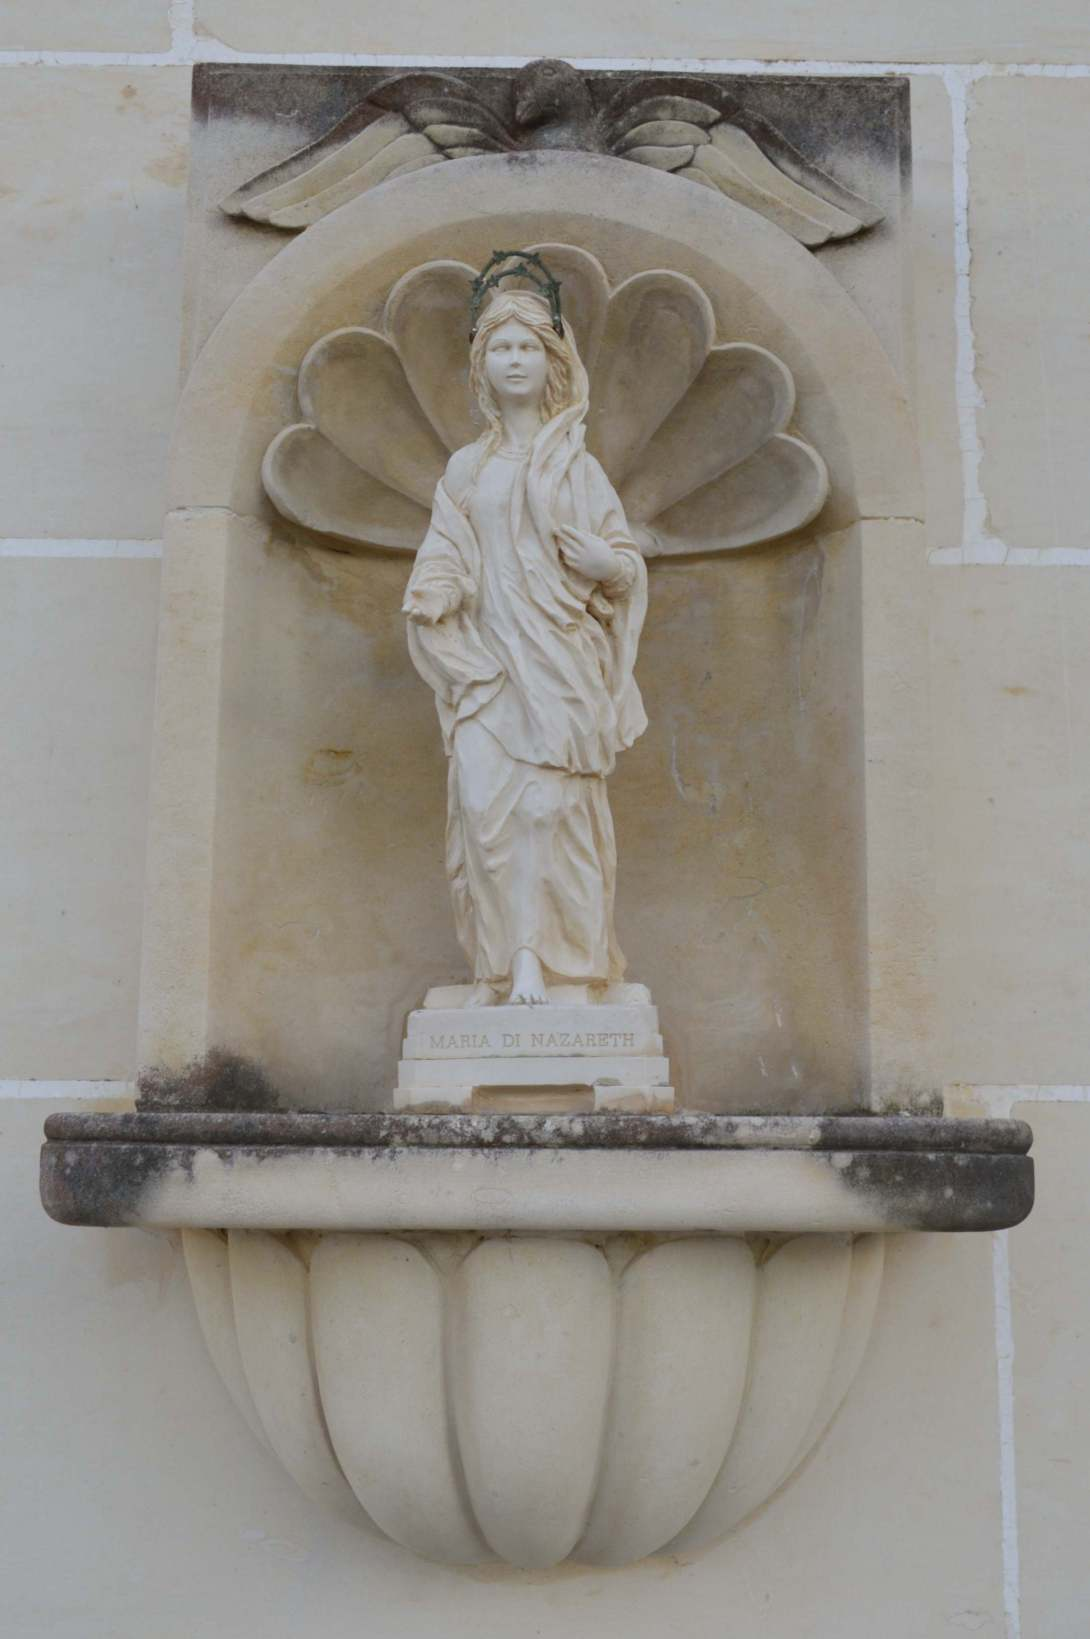 Maria de Nazareth Malta